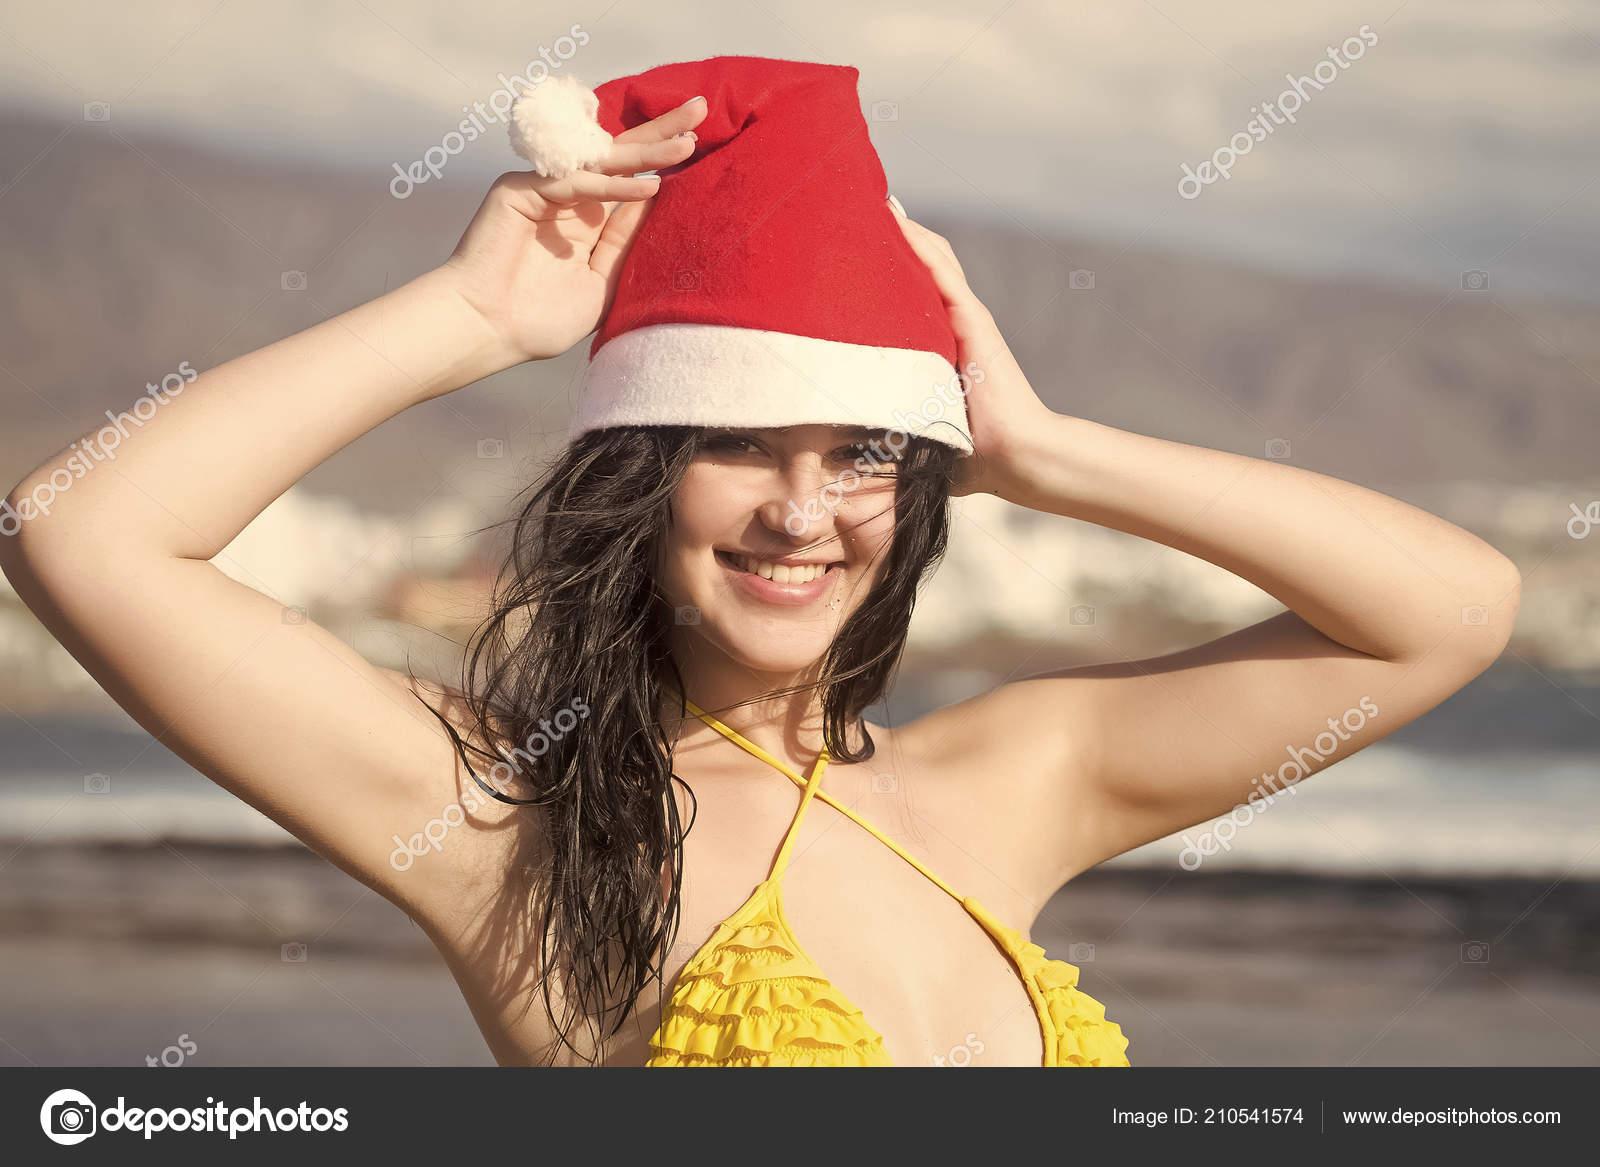 3e11516e39a3 Ευτυχισμένος κορίτσι χαμογελά στο Αϊ Βασίλη καπέλο στην παραλία της θάλασσας–  εικόνα αρχείου